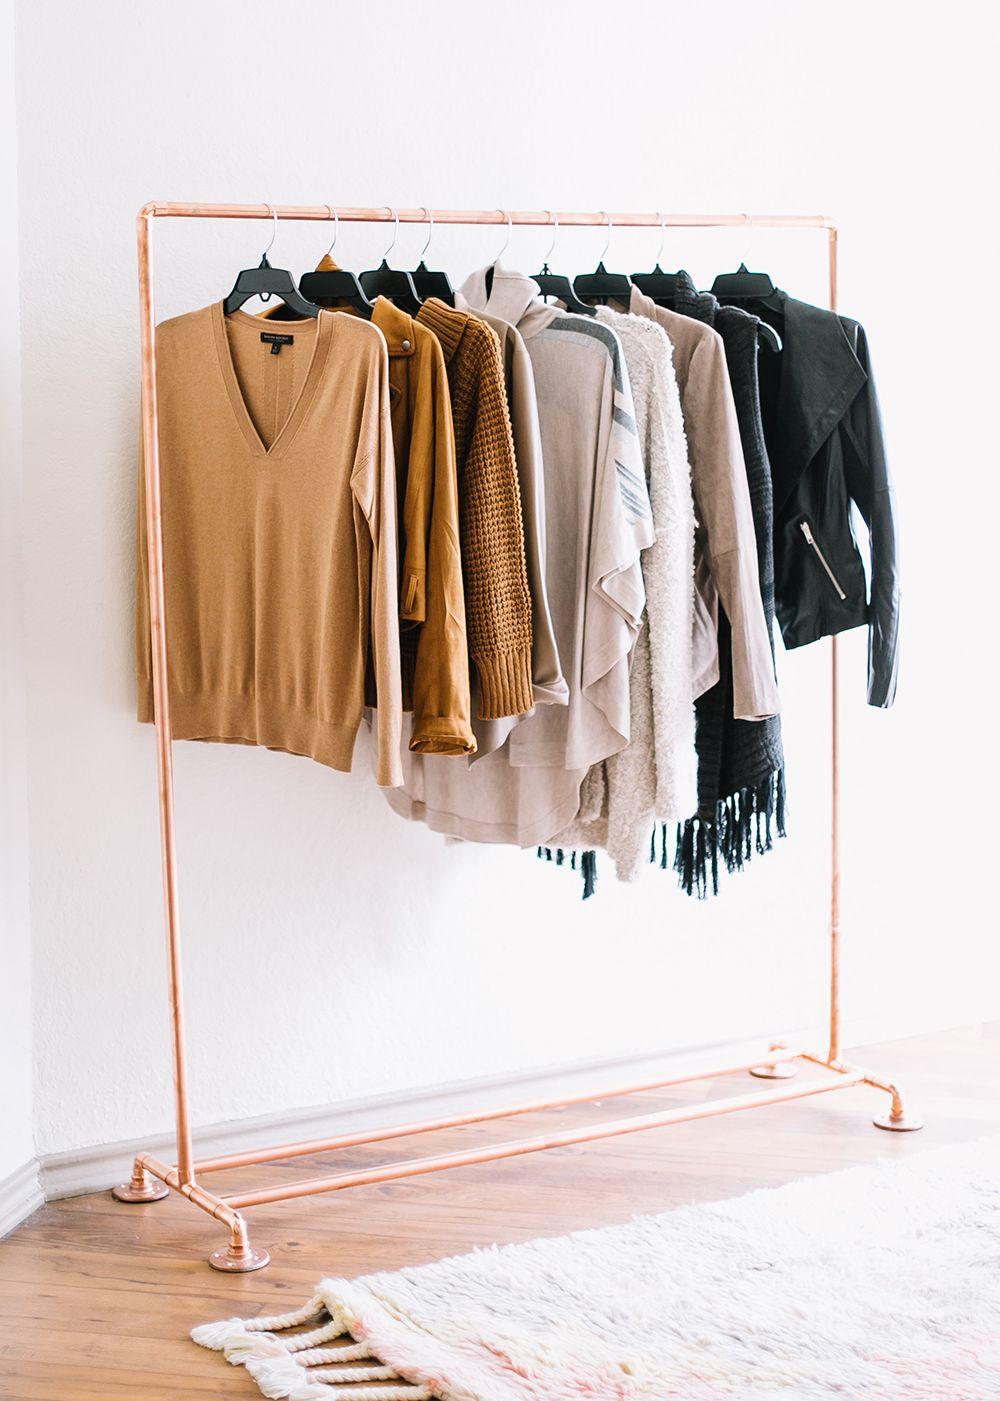 Copper Clothing Rack Livvyland Home Office Diy Clothes Rack Clothing Rack Bedroom Clothing Rack